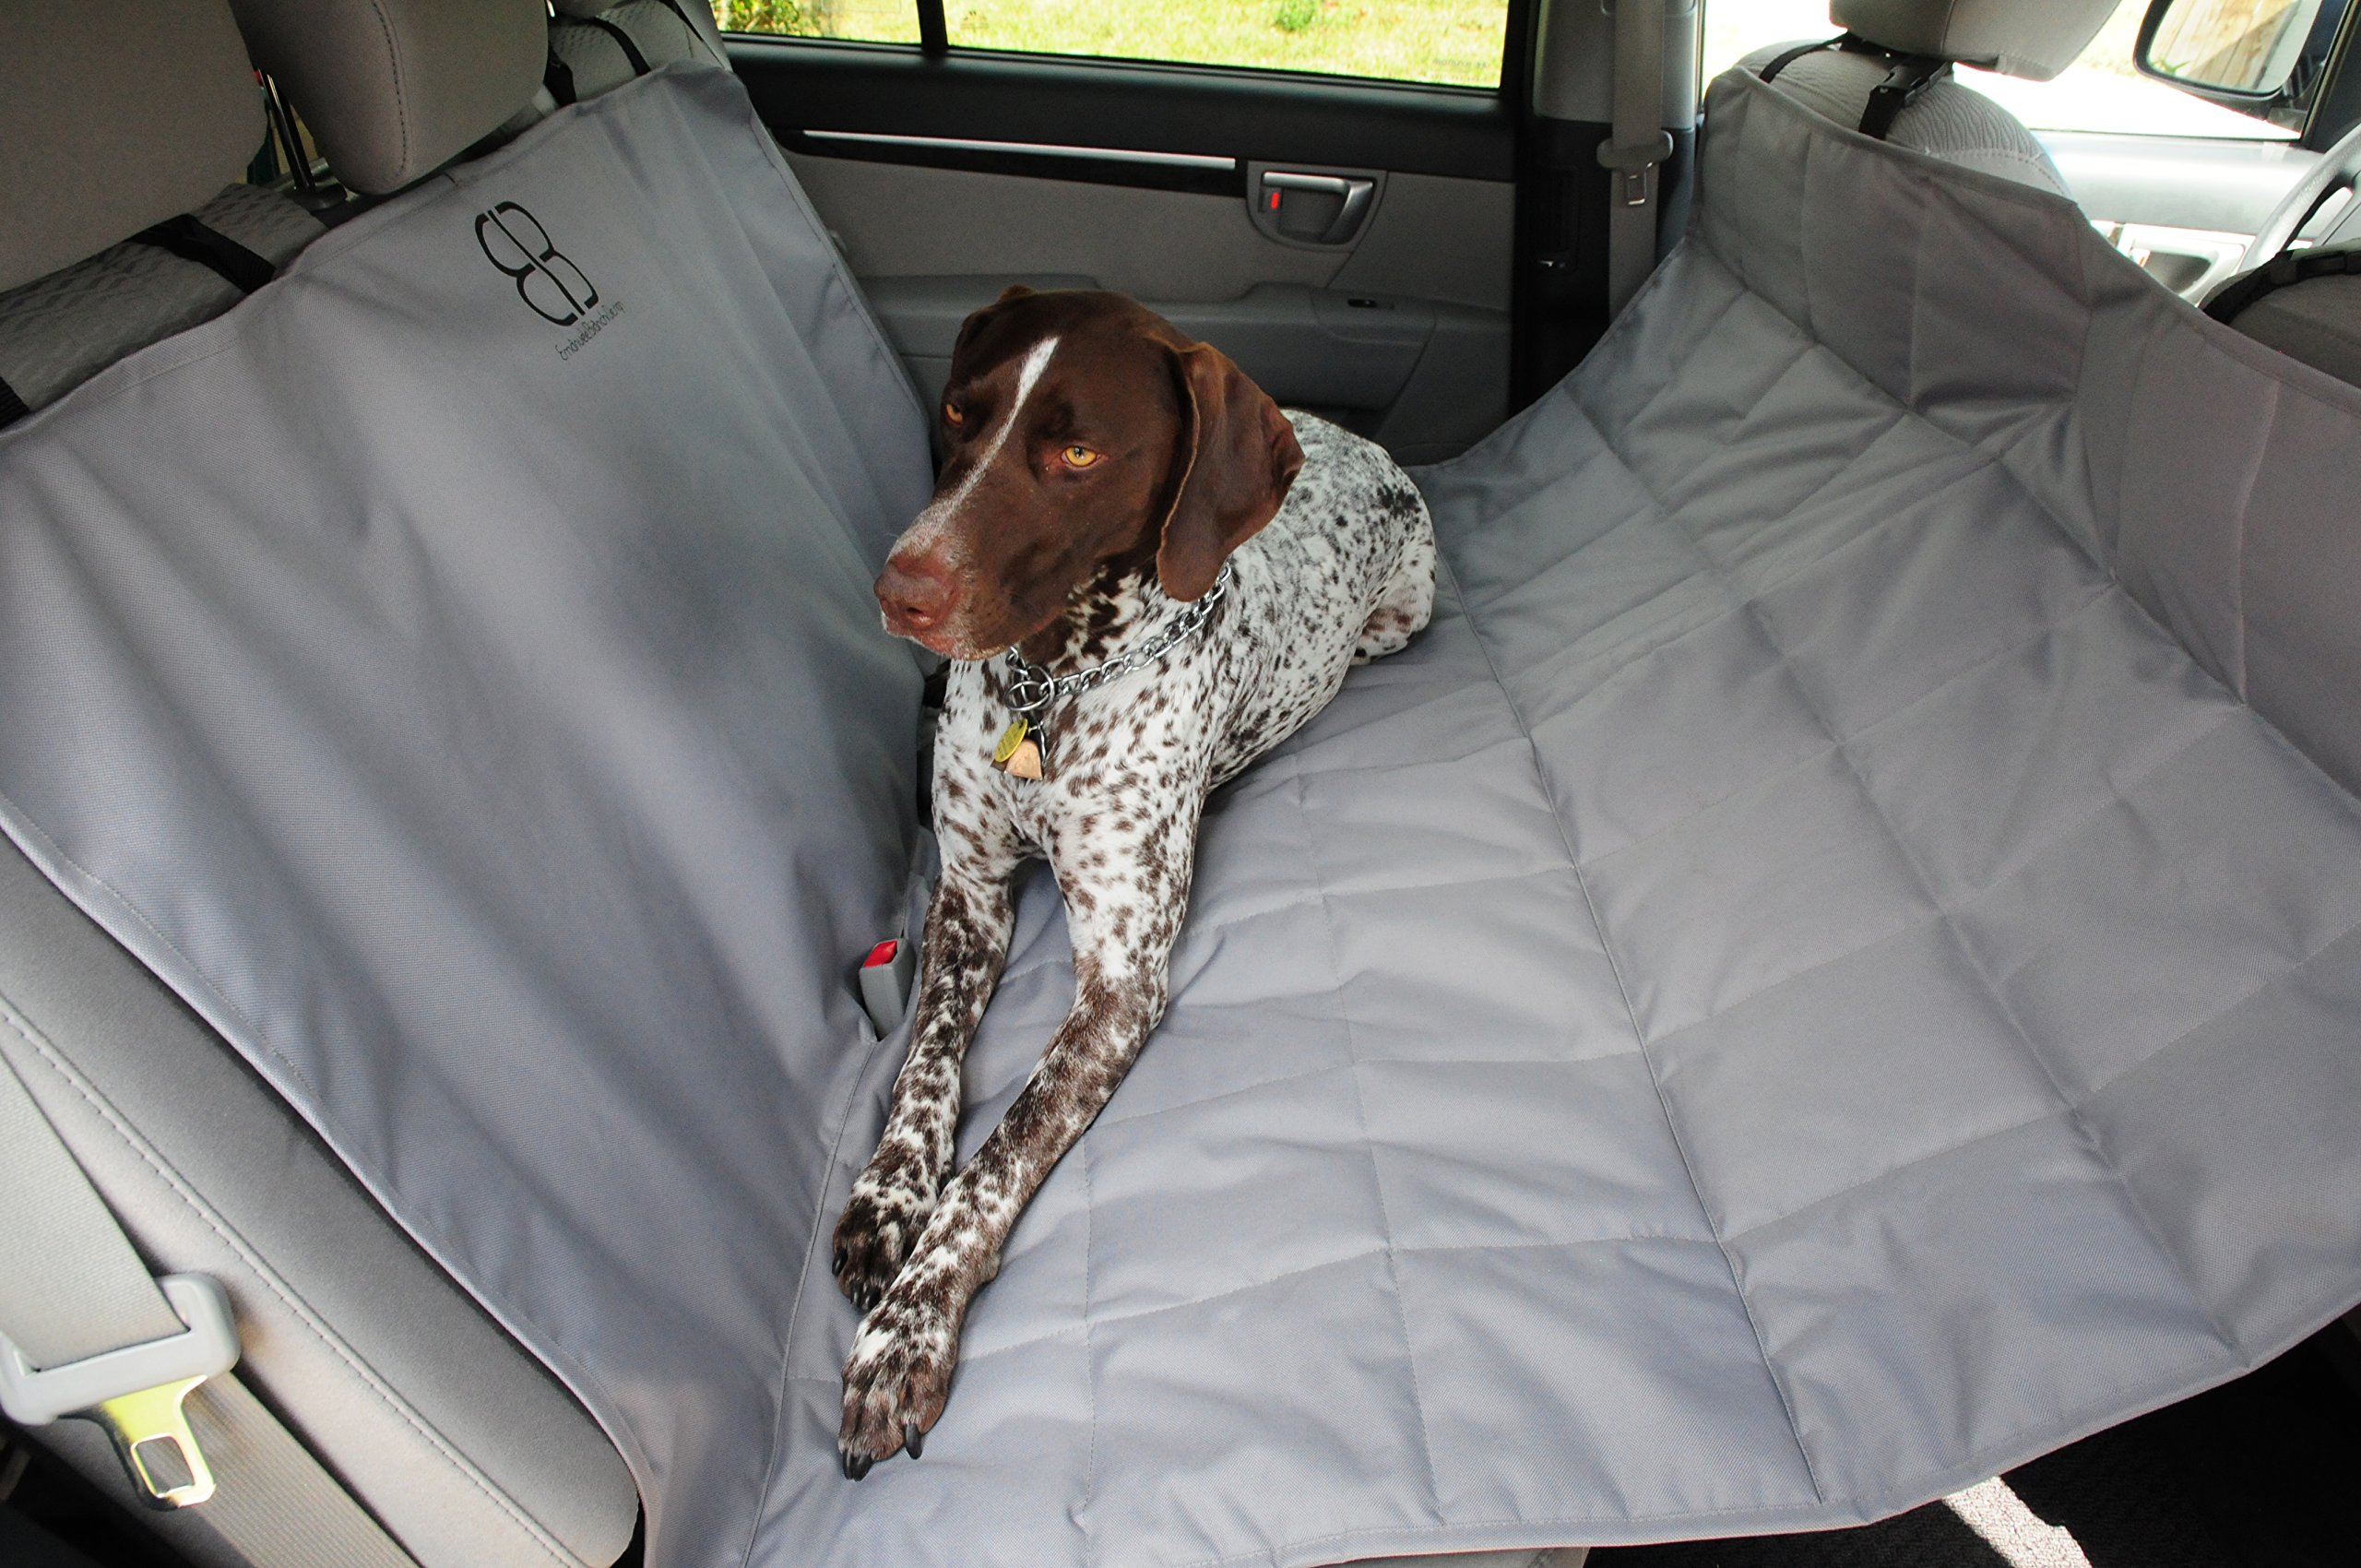 Petego Dog Car Seat Protector Hammock Gray X Large Product Image